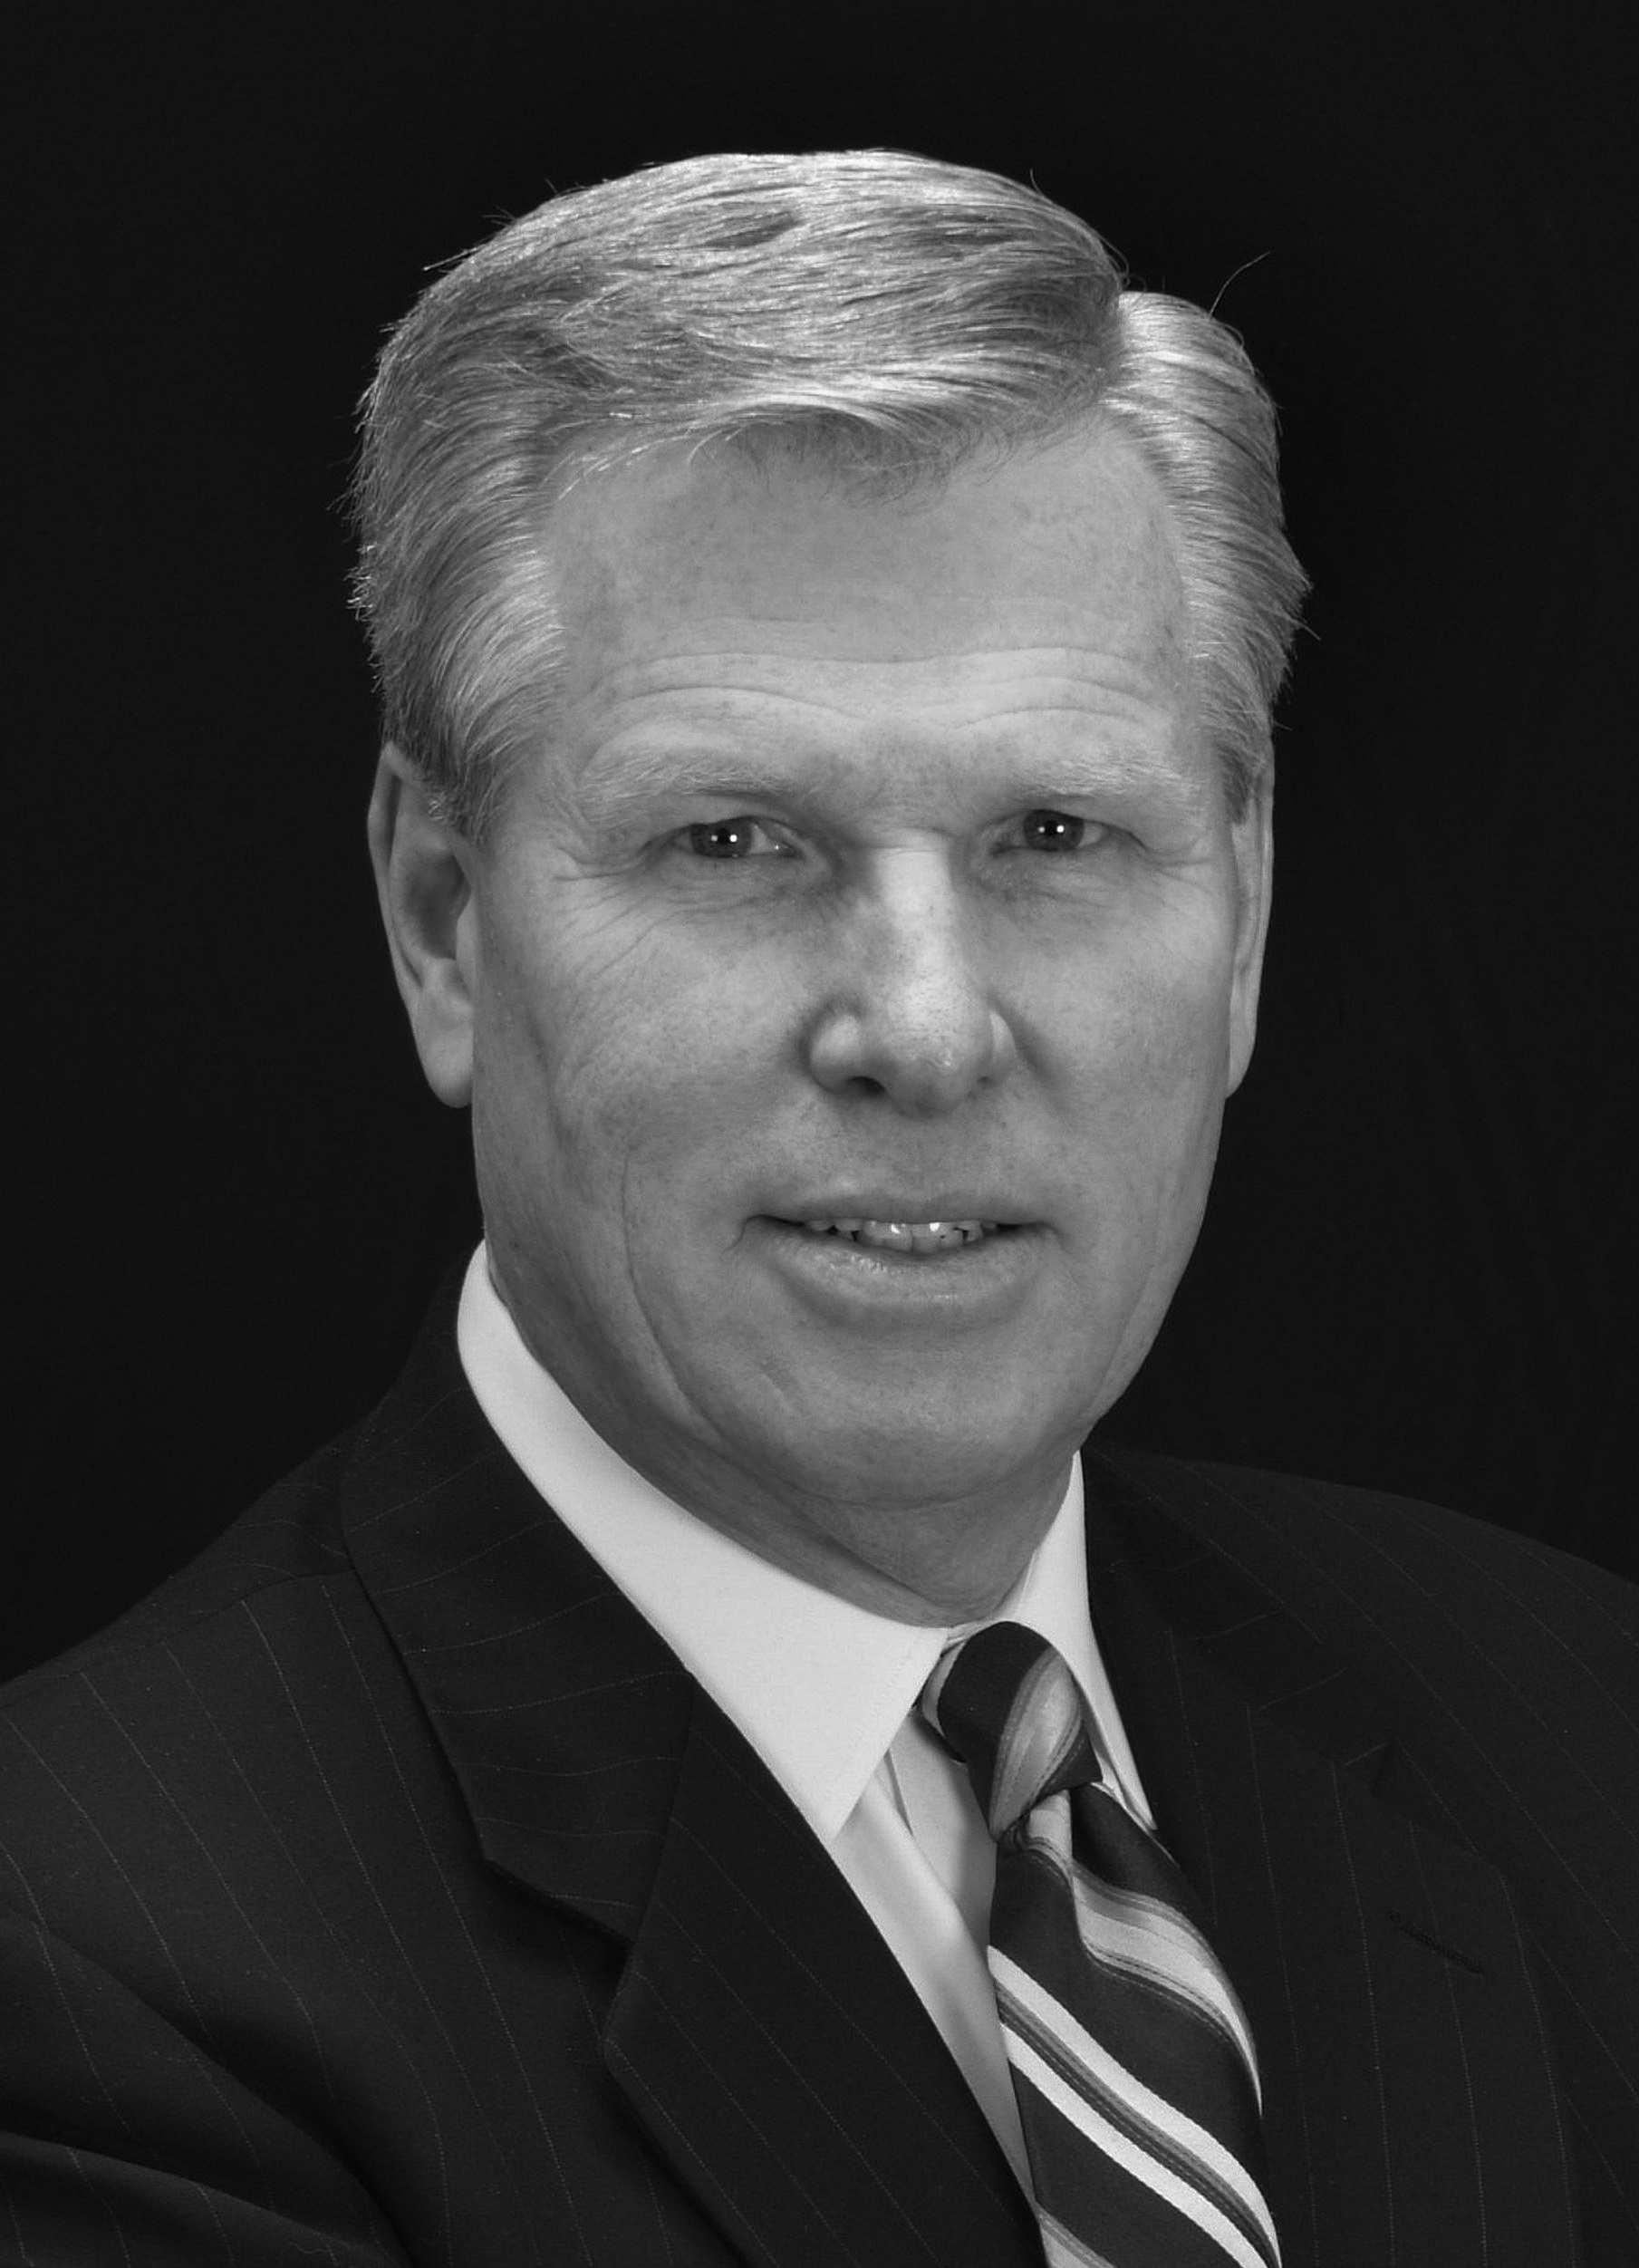 Kevin M. O'Connor